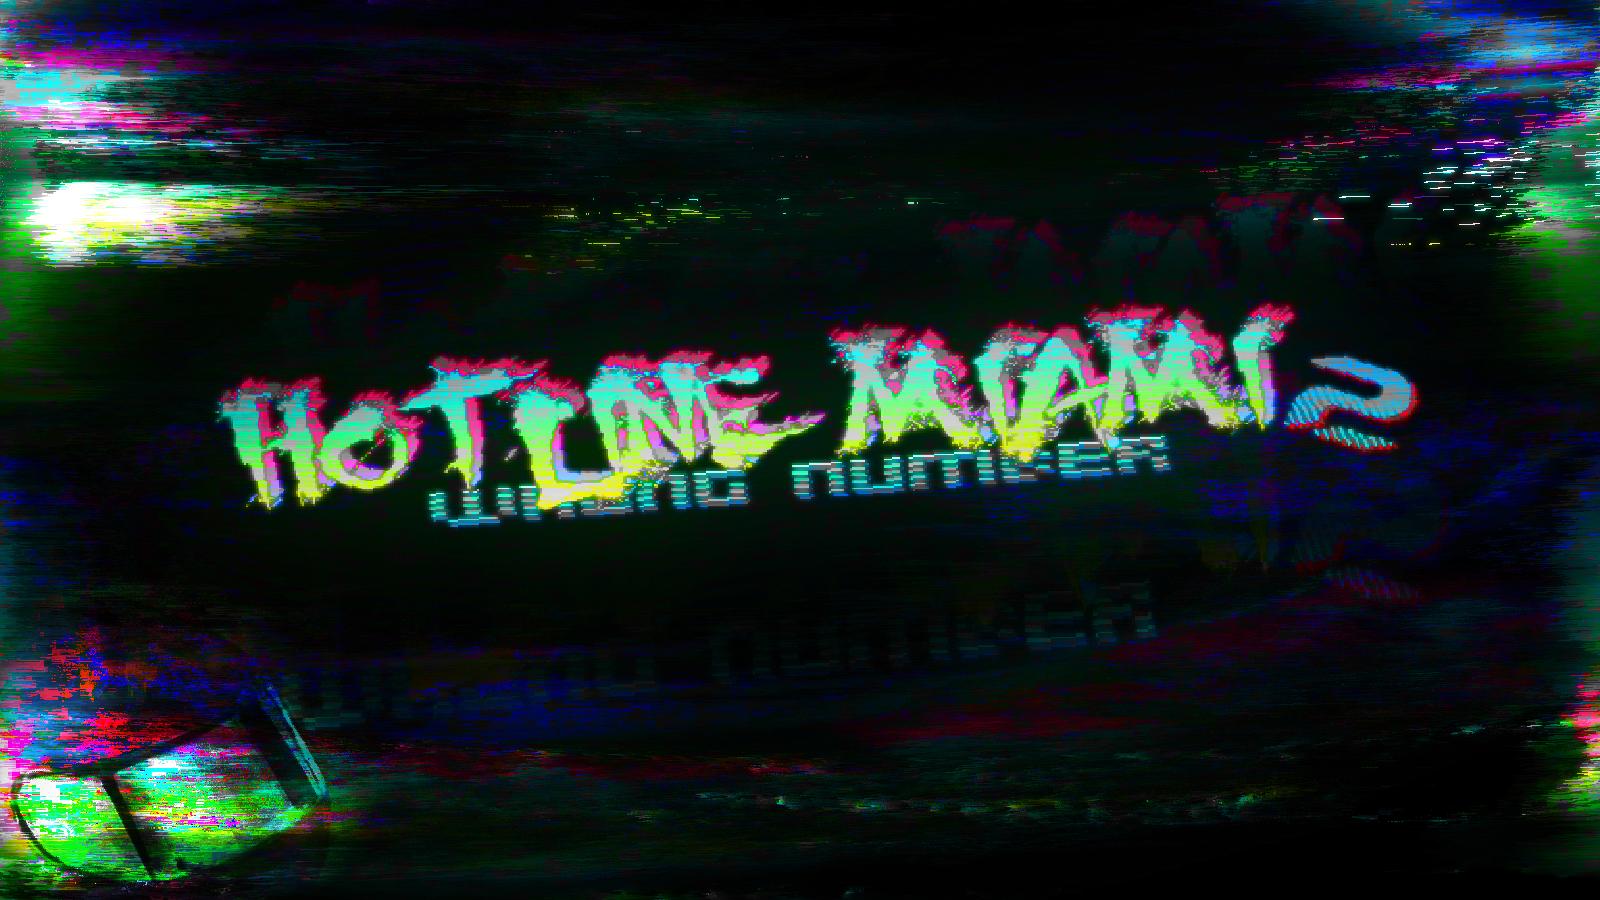 Programa 8x21 (13-03-2015) - 'Hotline Miami 2: Wrong Number' Community_image_1377866607